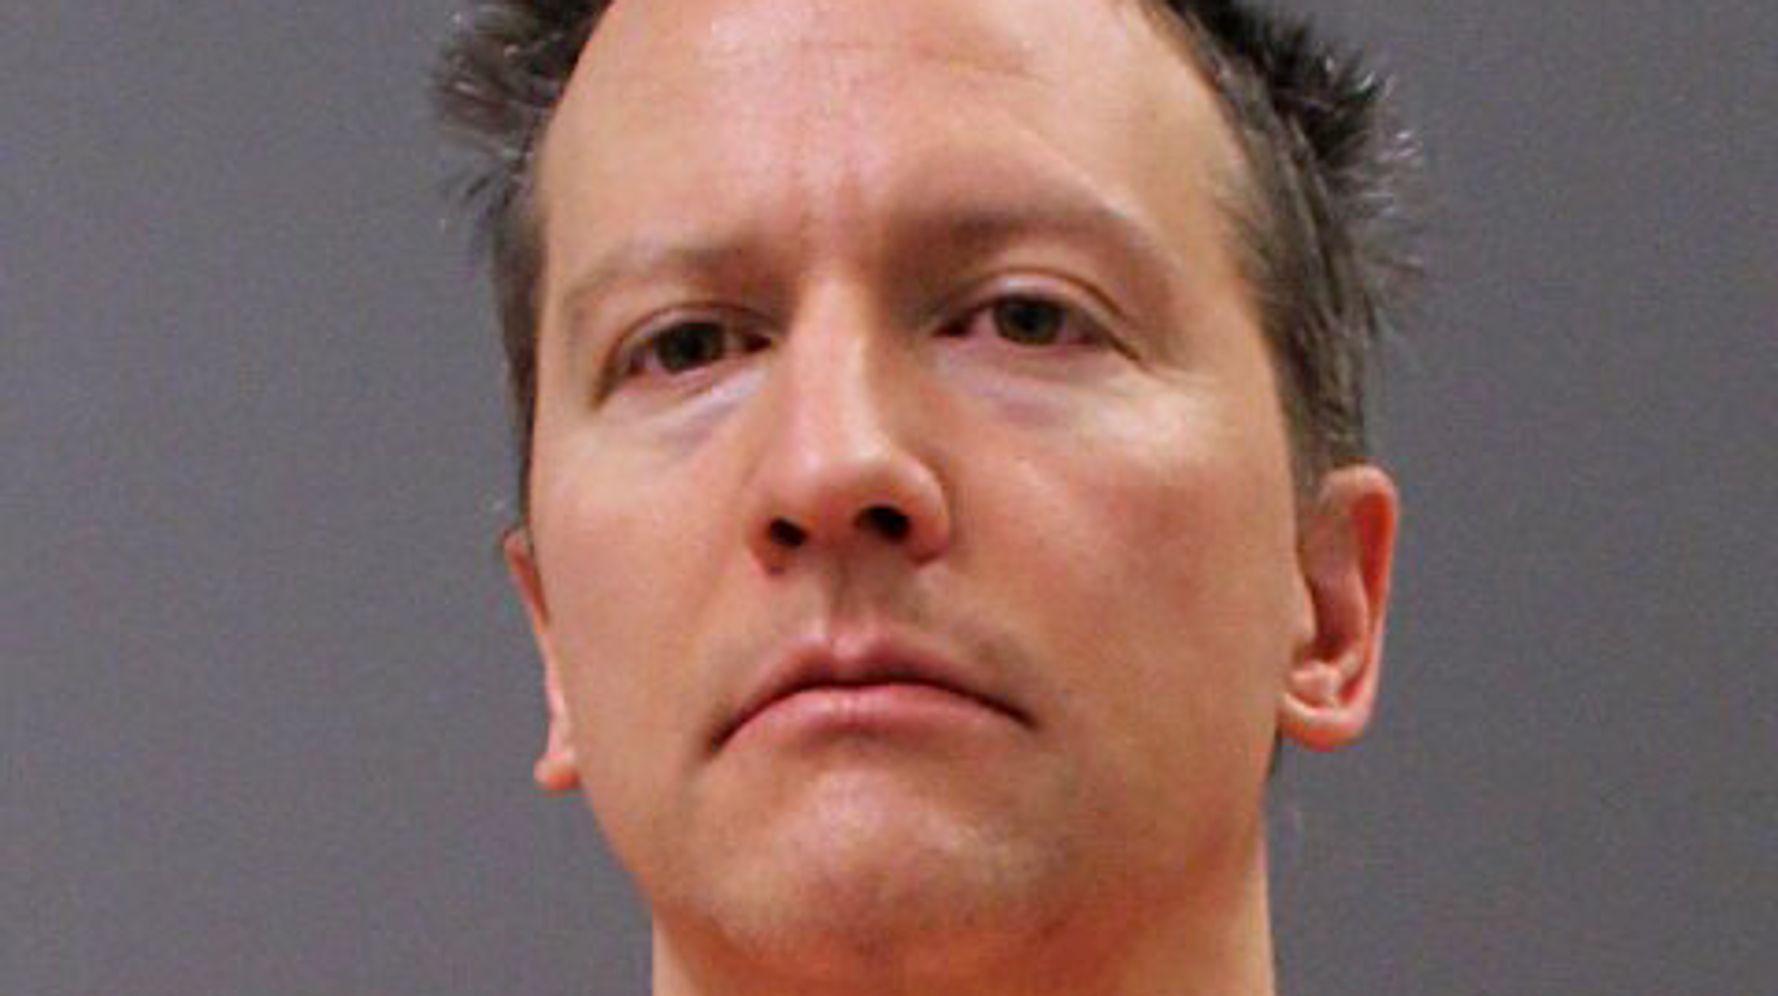 Derek Chauvin's Attorney Requests New Trial For 'Jury Misconduct'